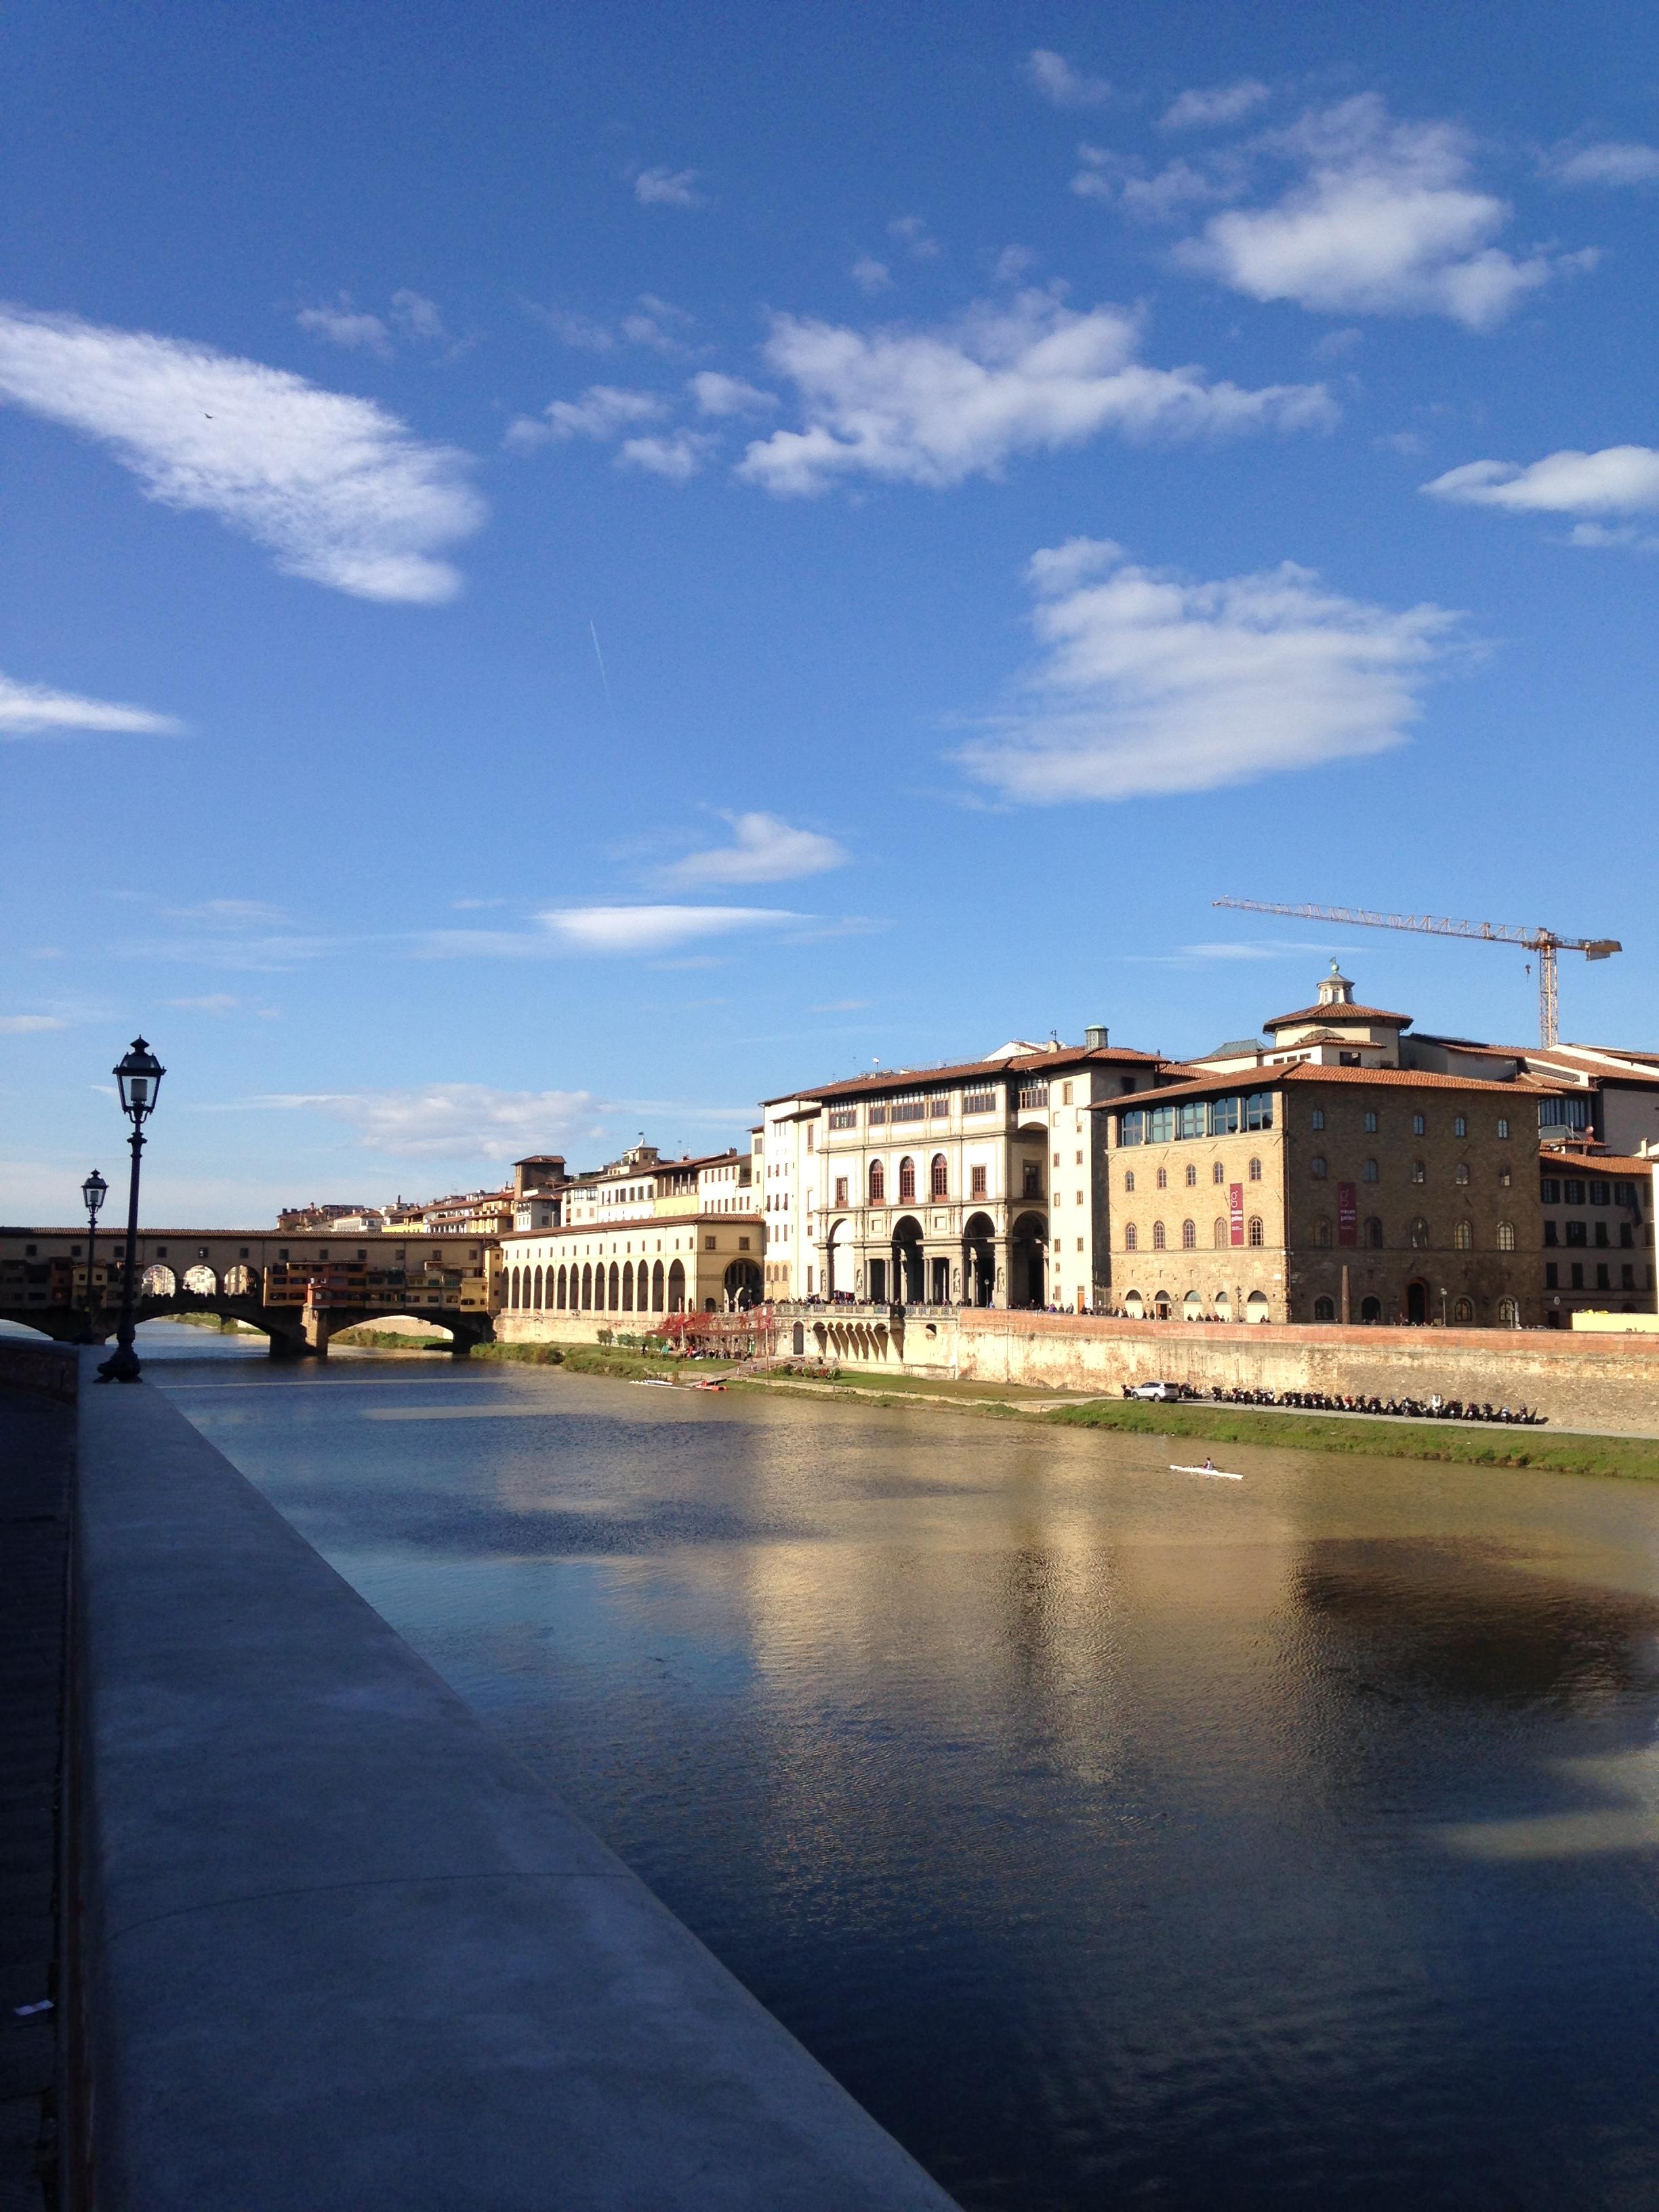 November Florence 2017 uffizi gallery without the crowds